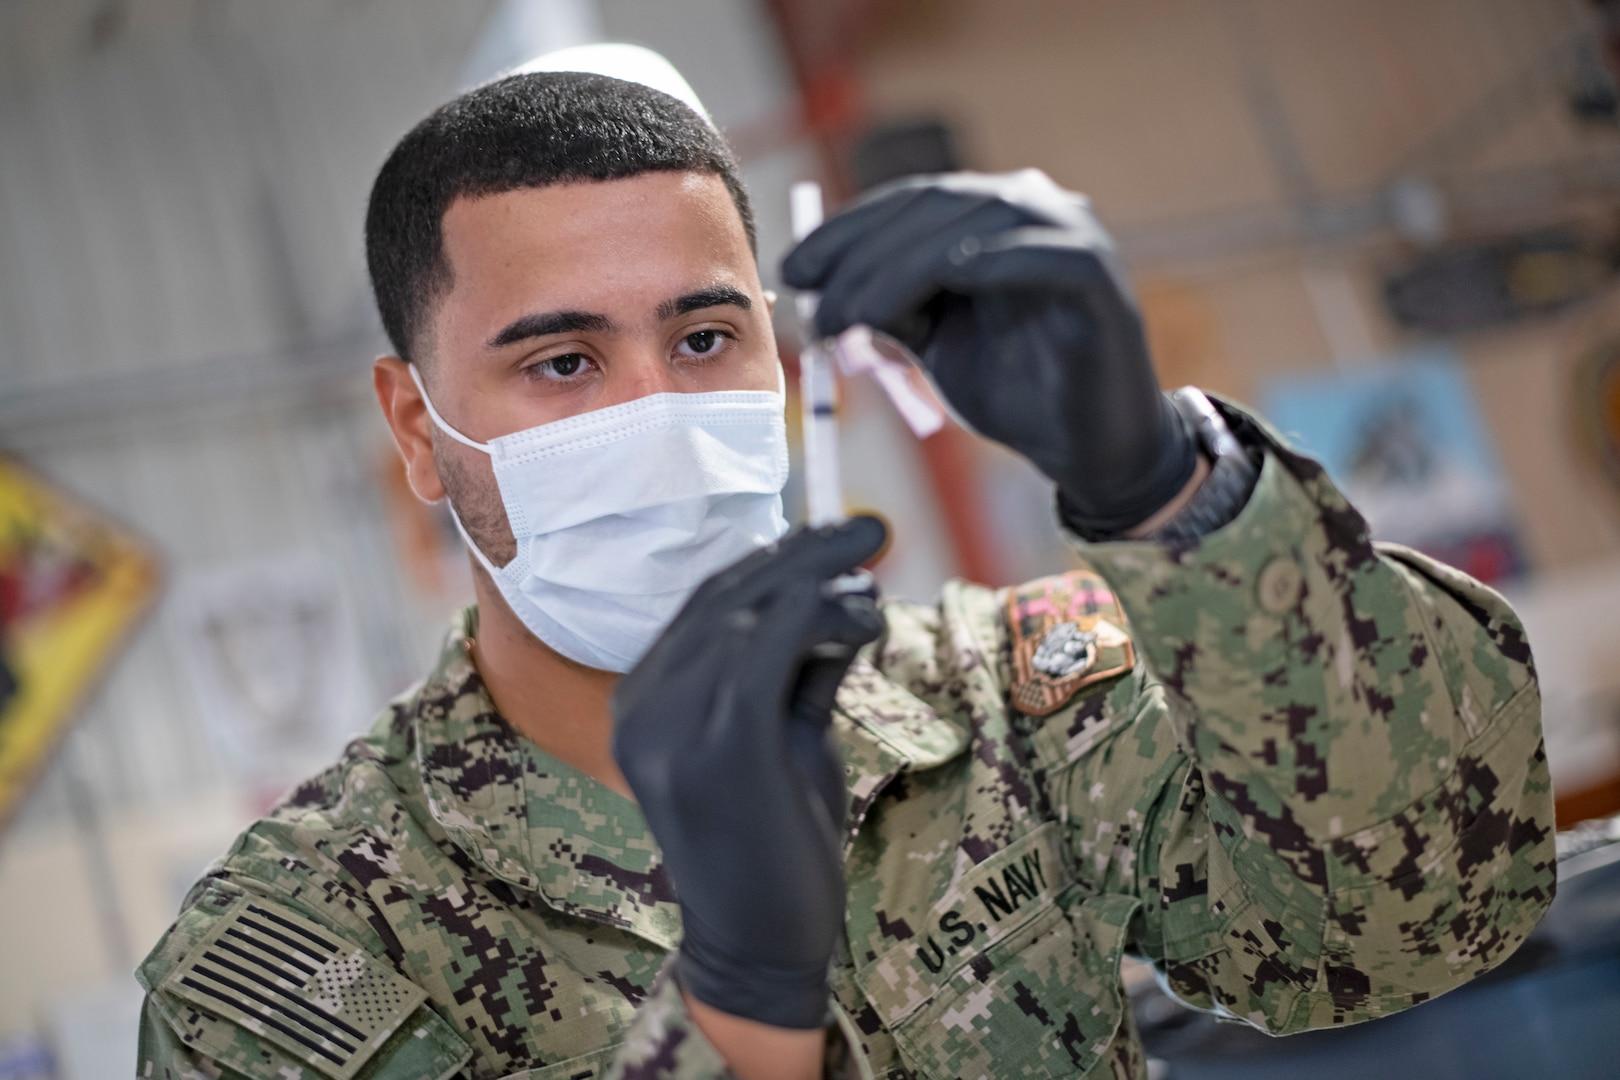 Service member prepares COVID-19 vaccine supplies